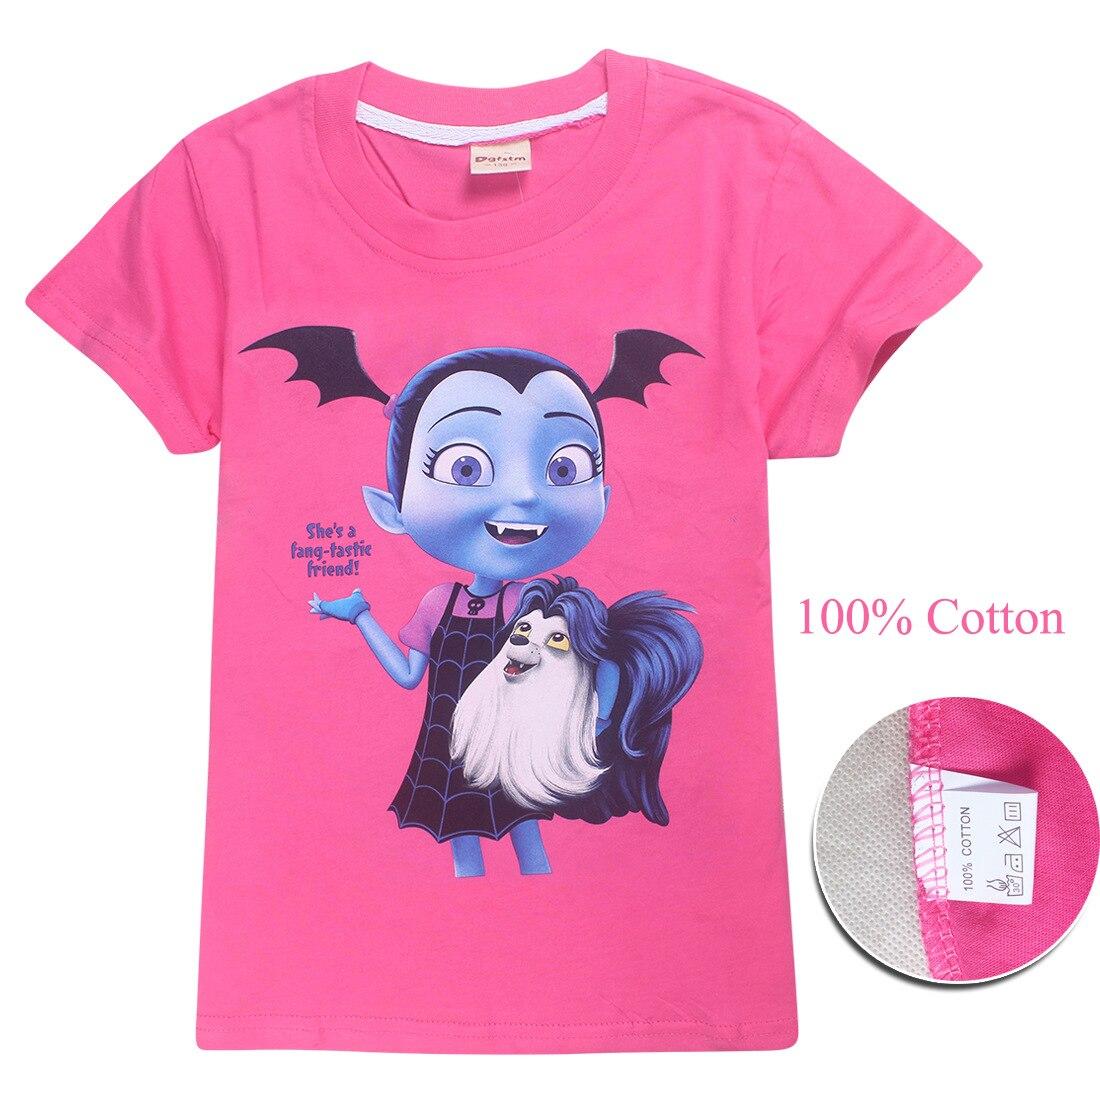 Summer Purple/Red Short Sleeve T-shirt Tshirt Tops Tees Junior Vampirina Cosplay Costume Clothes Girls Birthday Party Gift